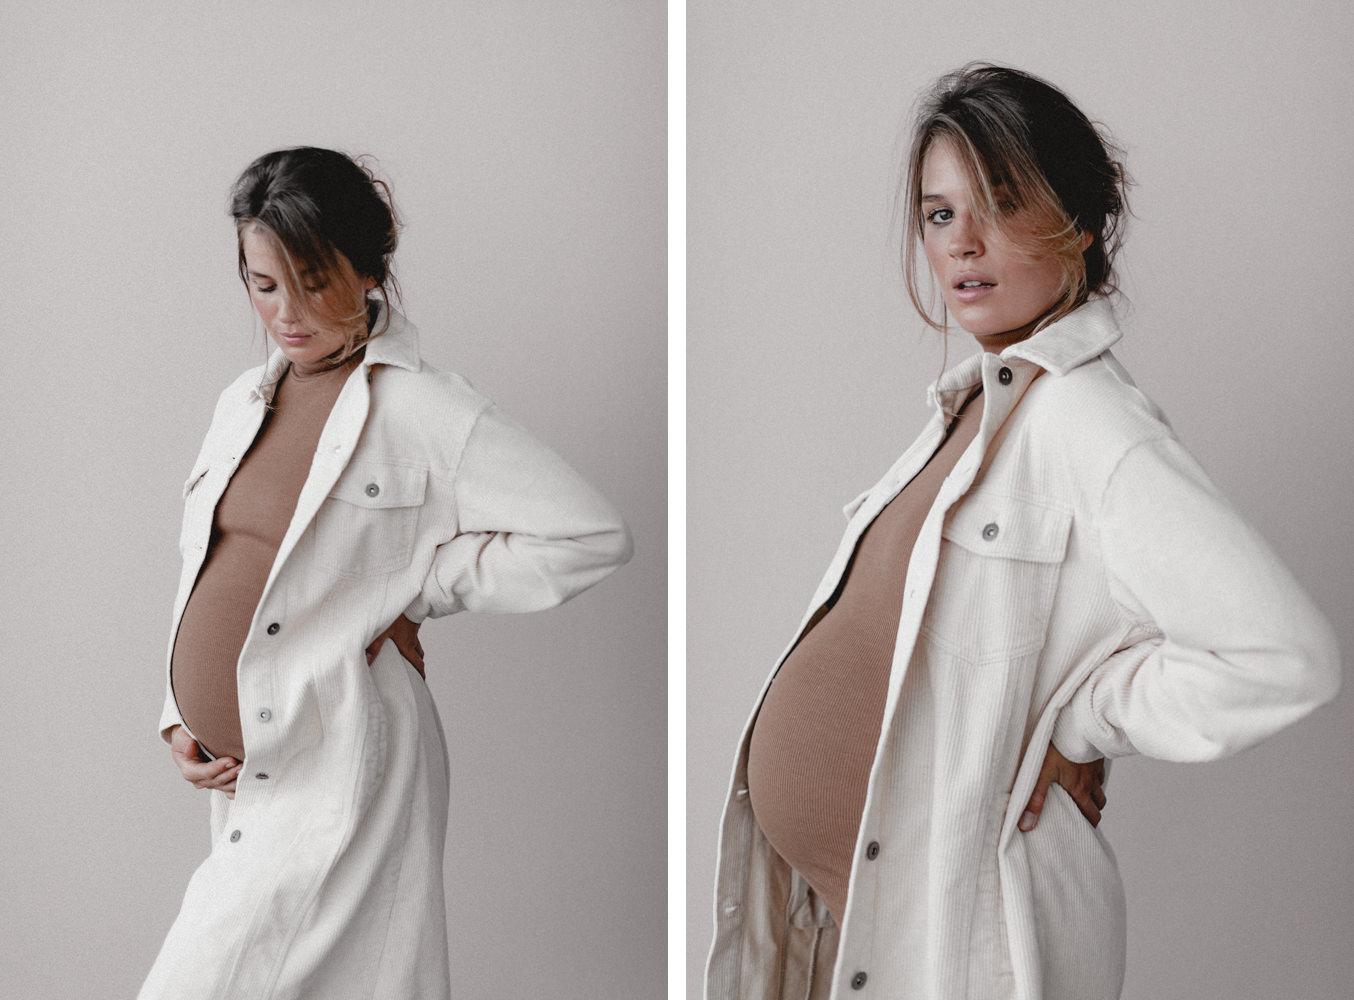 Schwangerschaft Shooting mit Fotografin Bina Terré im Sunny Loft in Düsseldorf